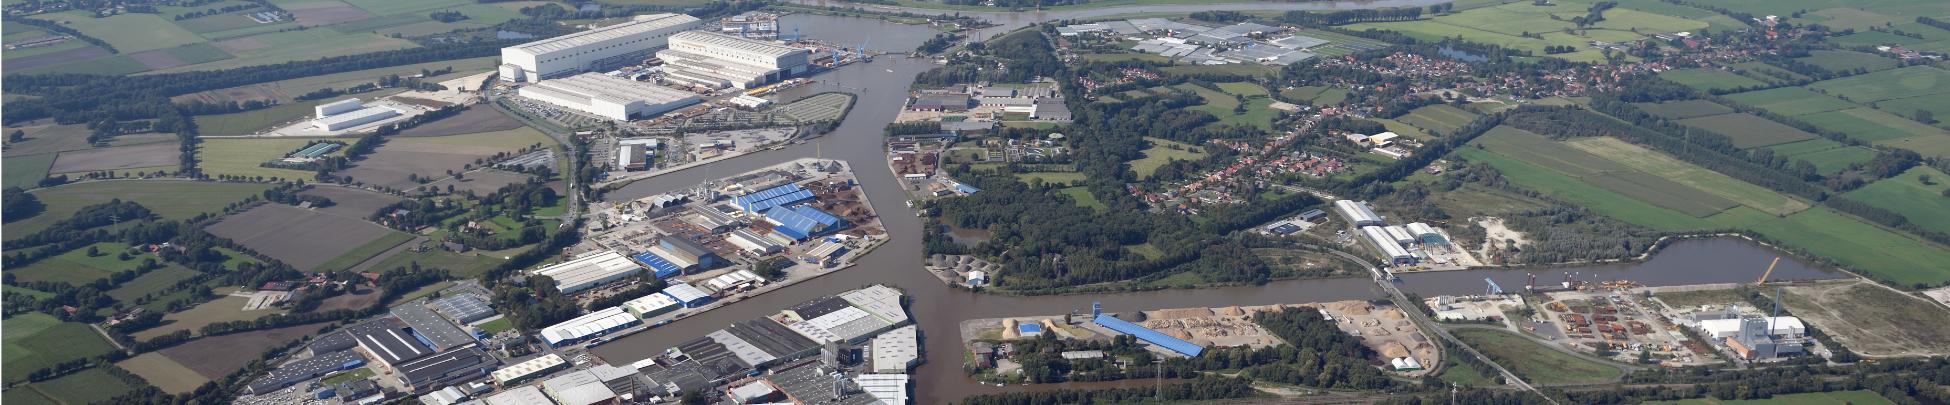 https://www.seaports.de/content/uploads/Papenburg_banner.jpg